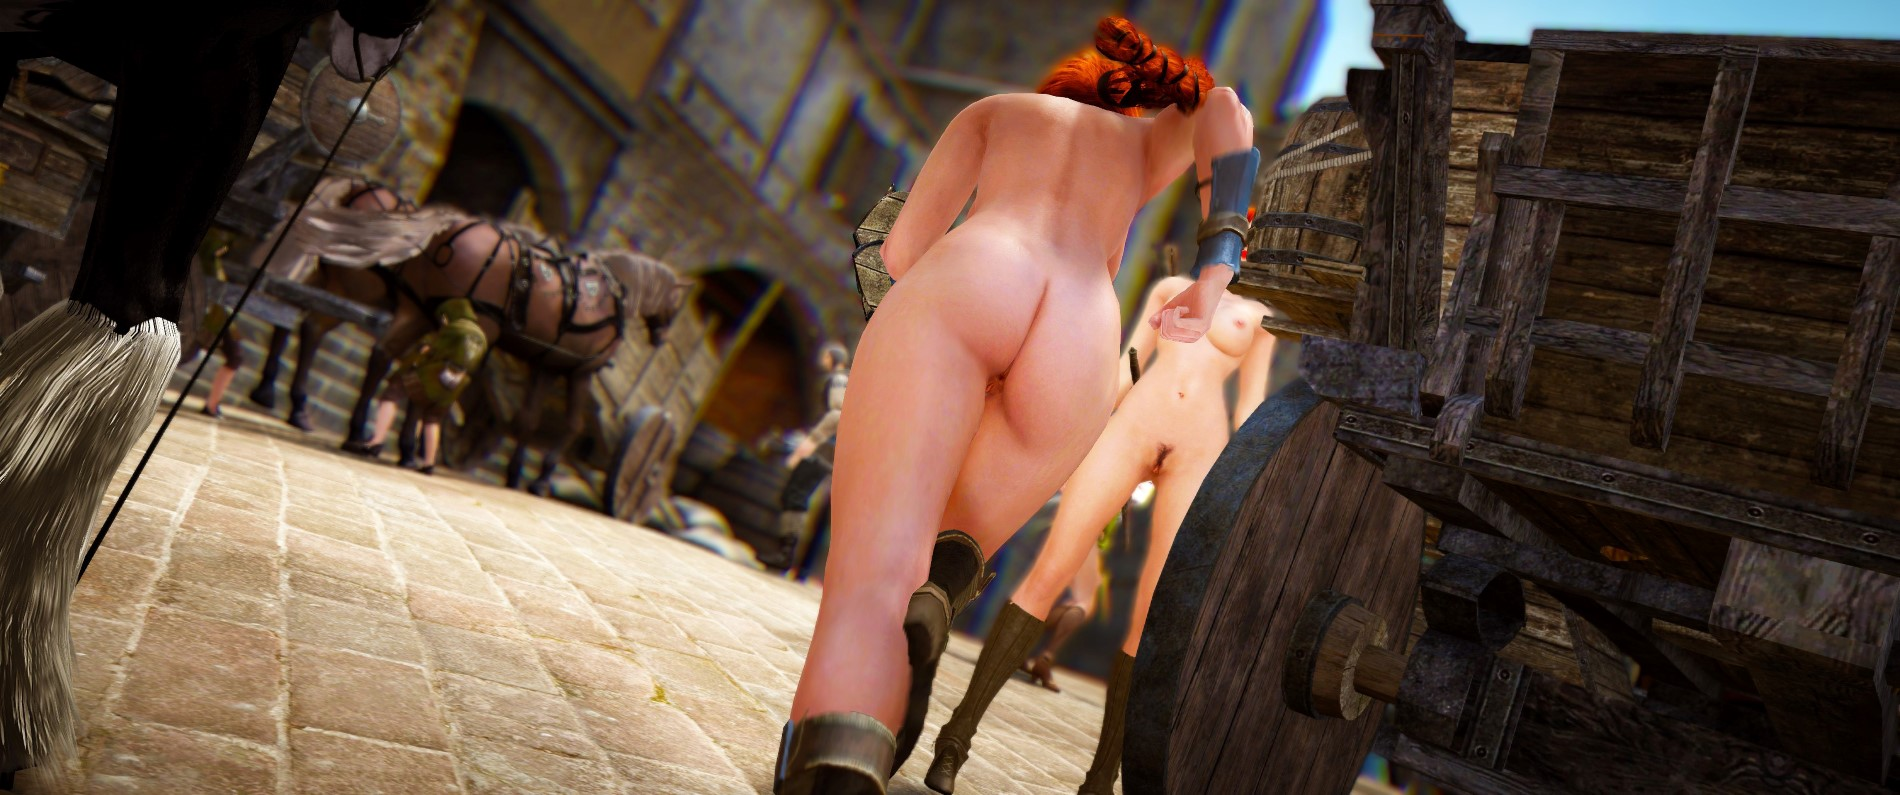 Nude mod game list nackt scene